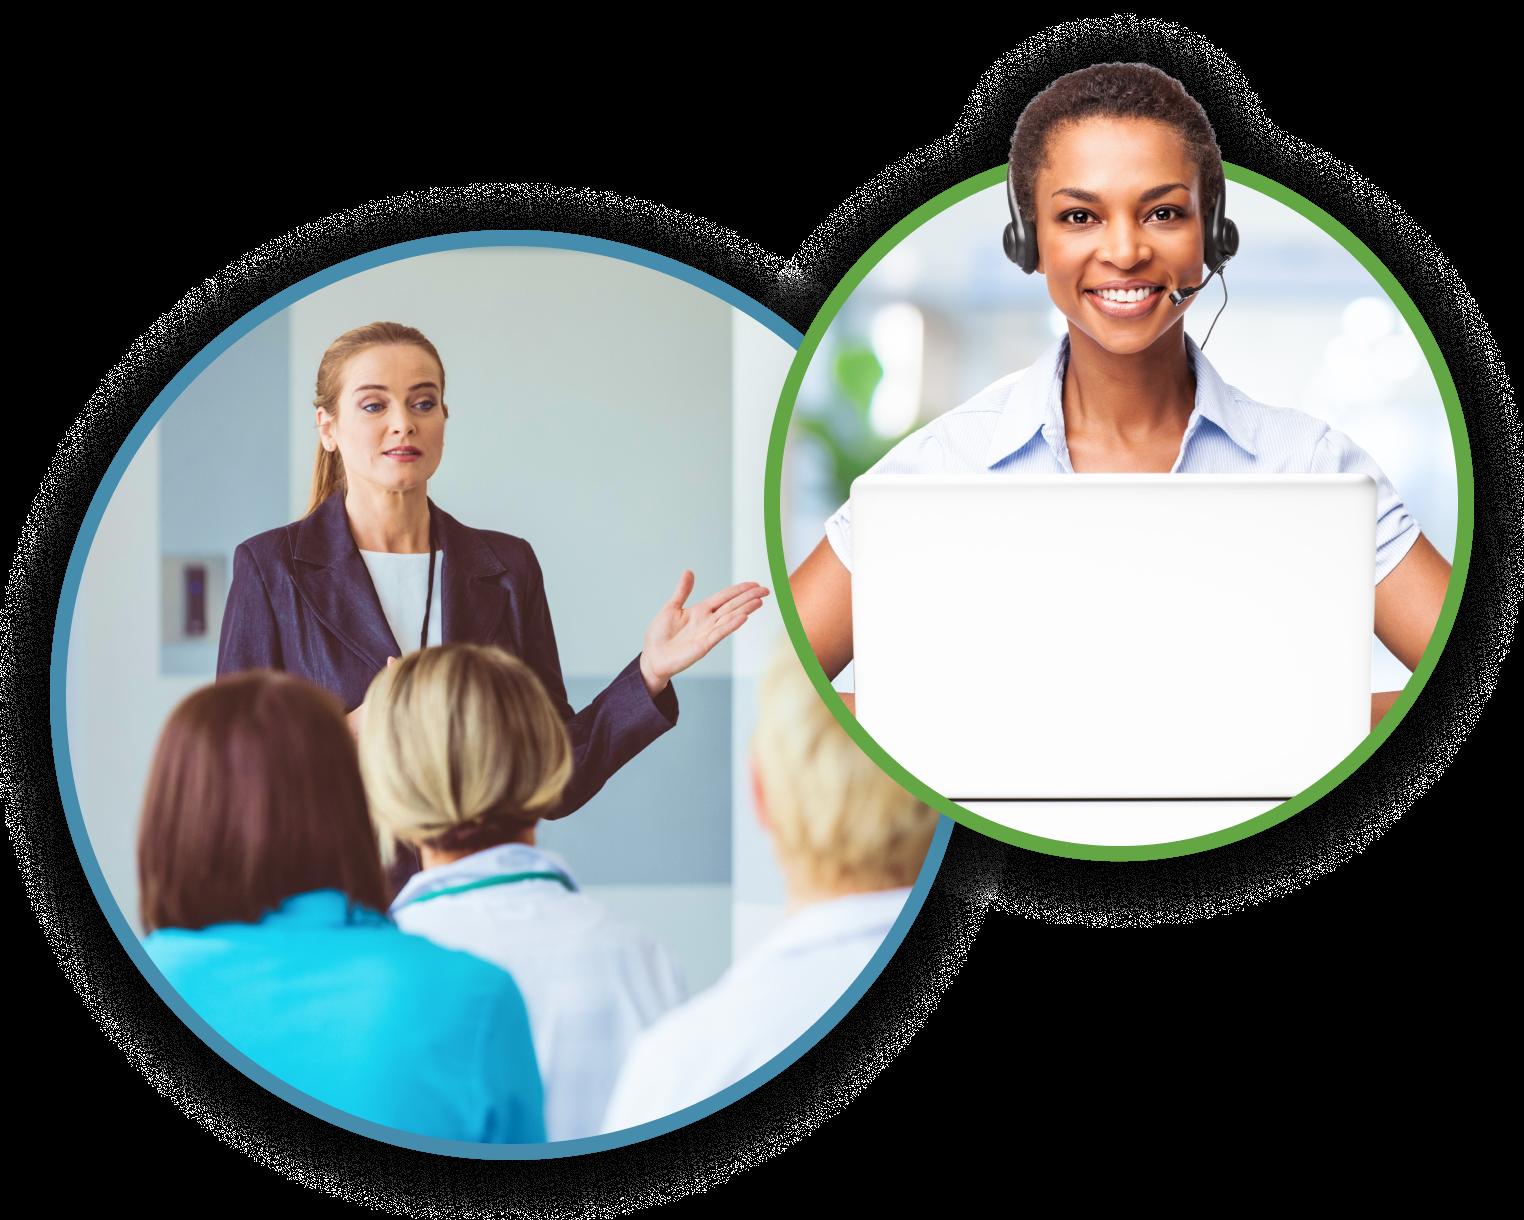 Practice partner training program desktop